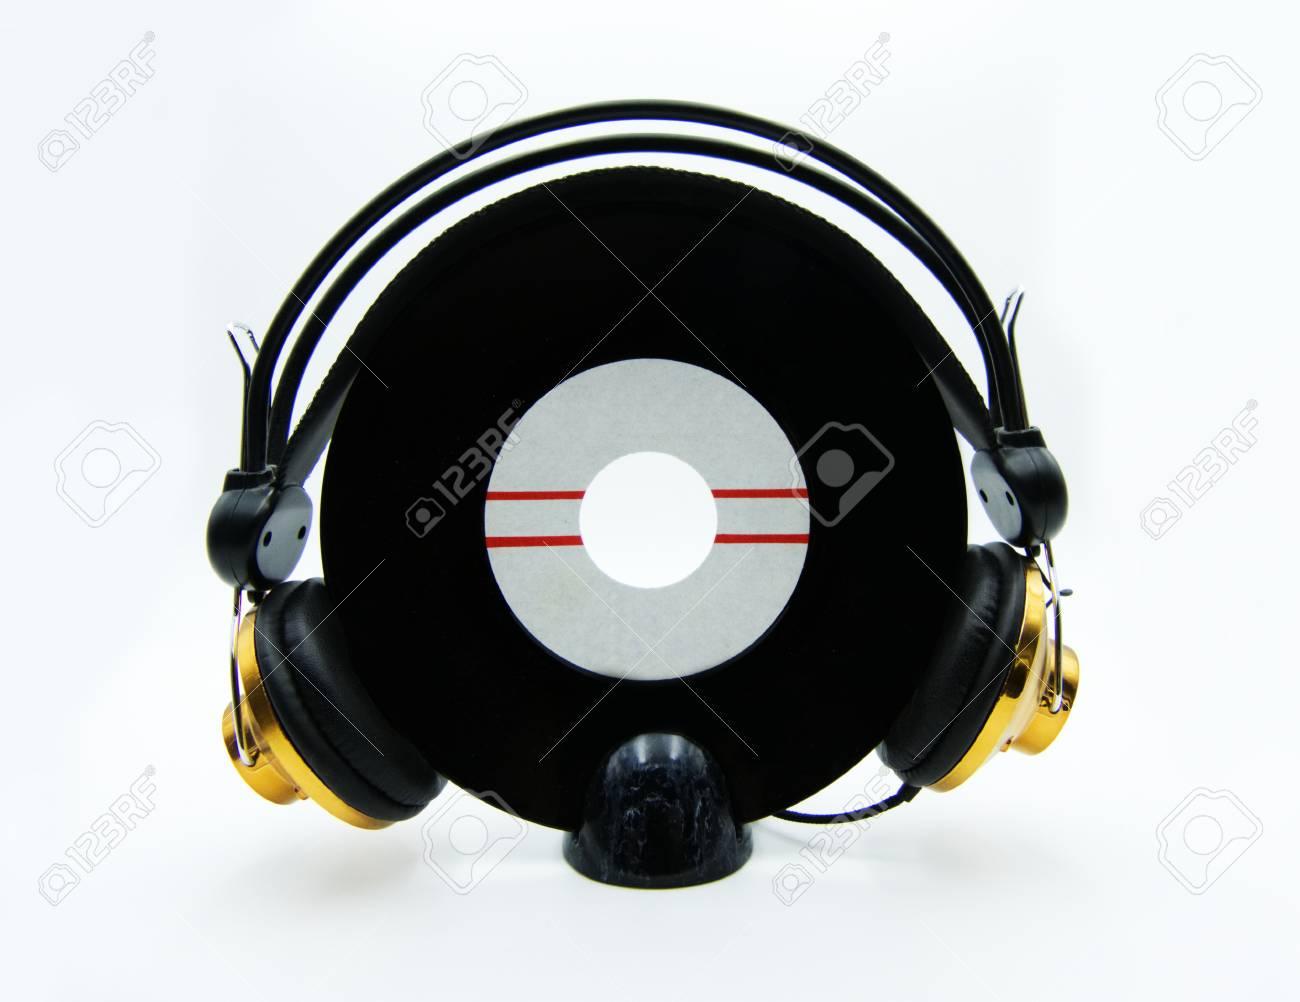 Vinyl single record with golden headphones on white background - 125366834